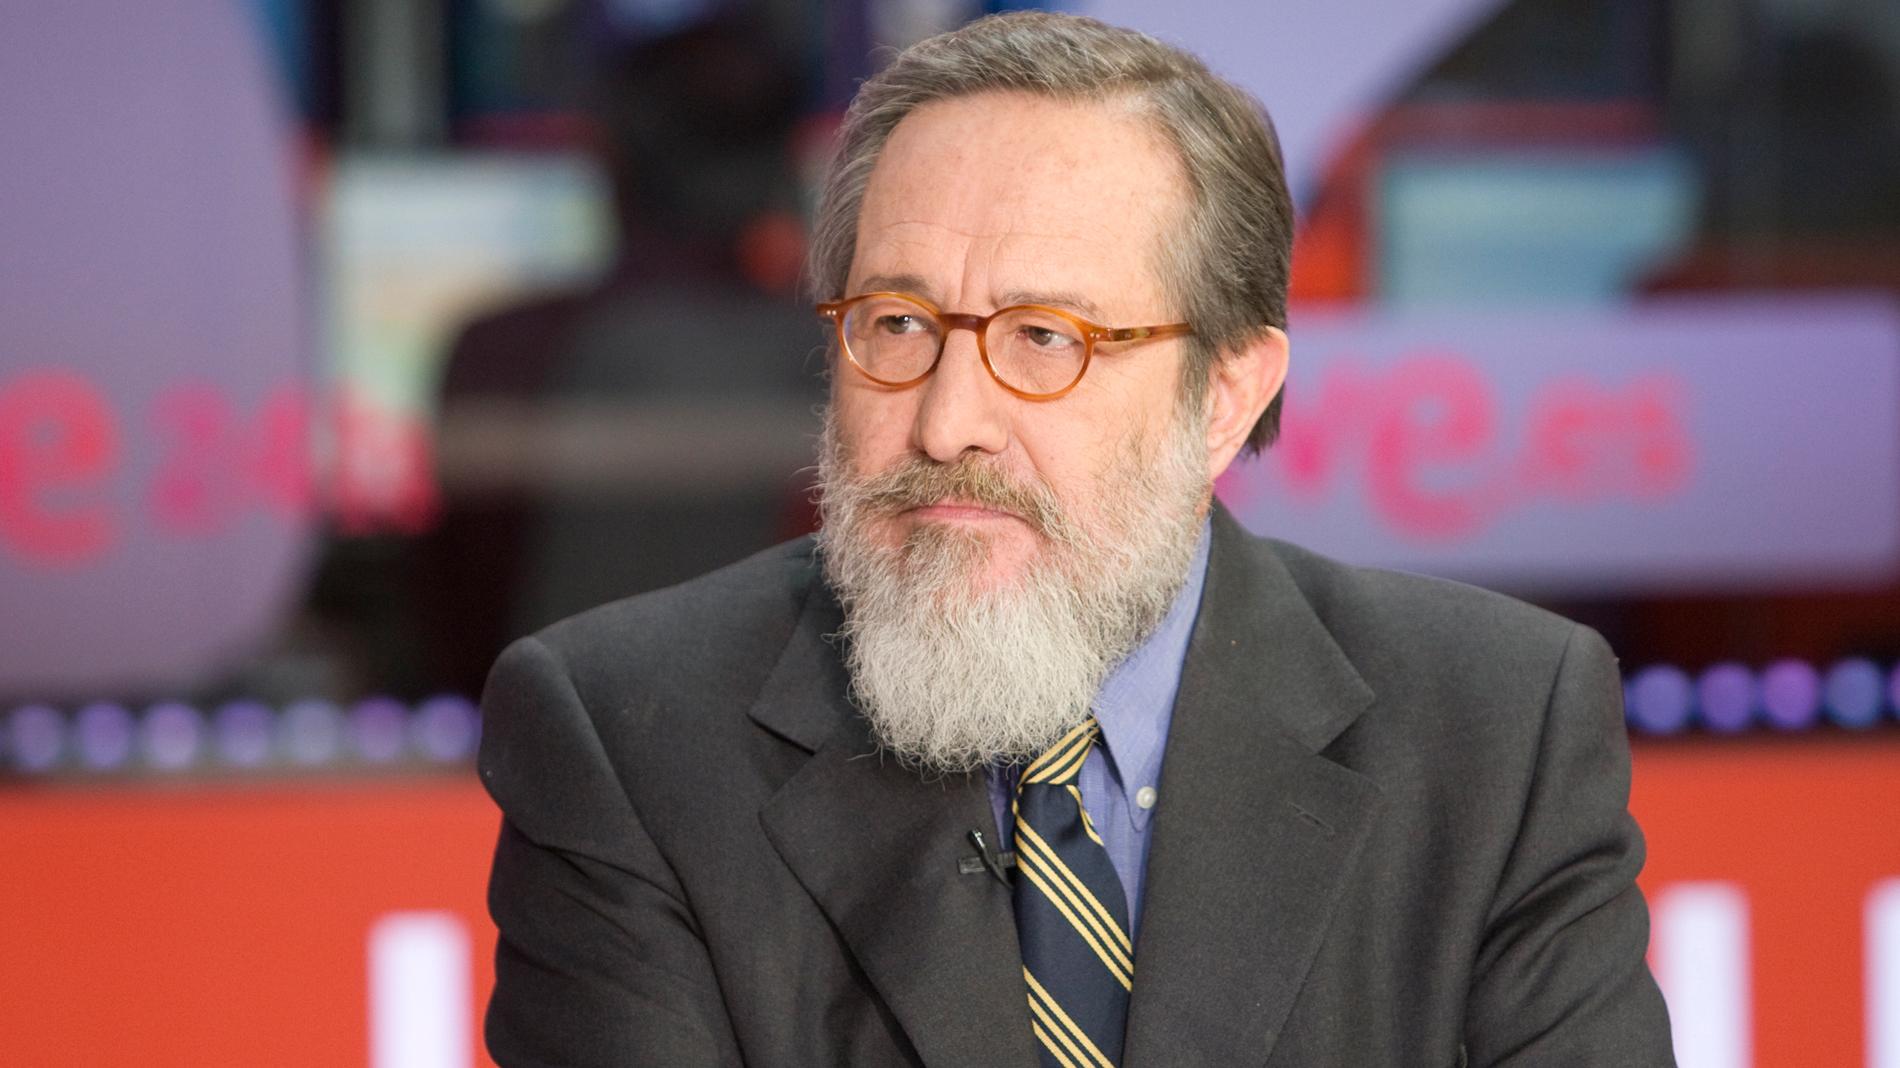 Muere Pedro Erquicia, histórico periodista de TVE